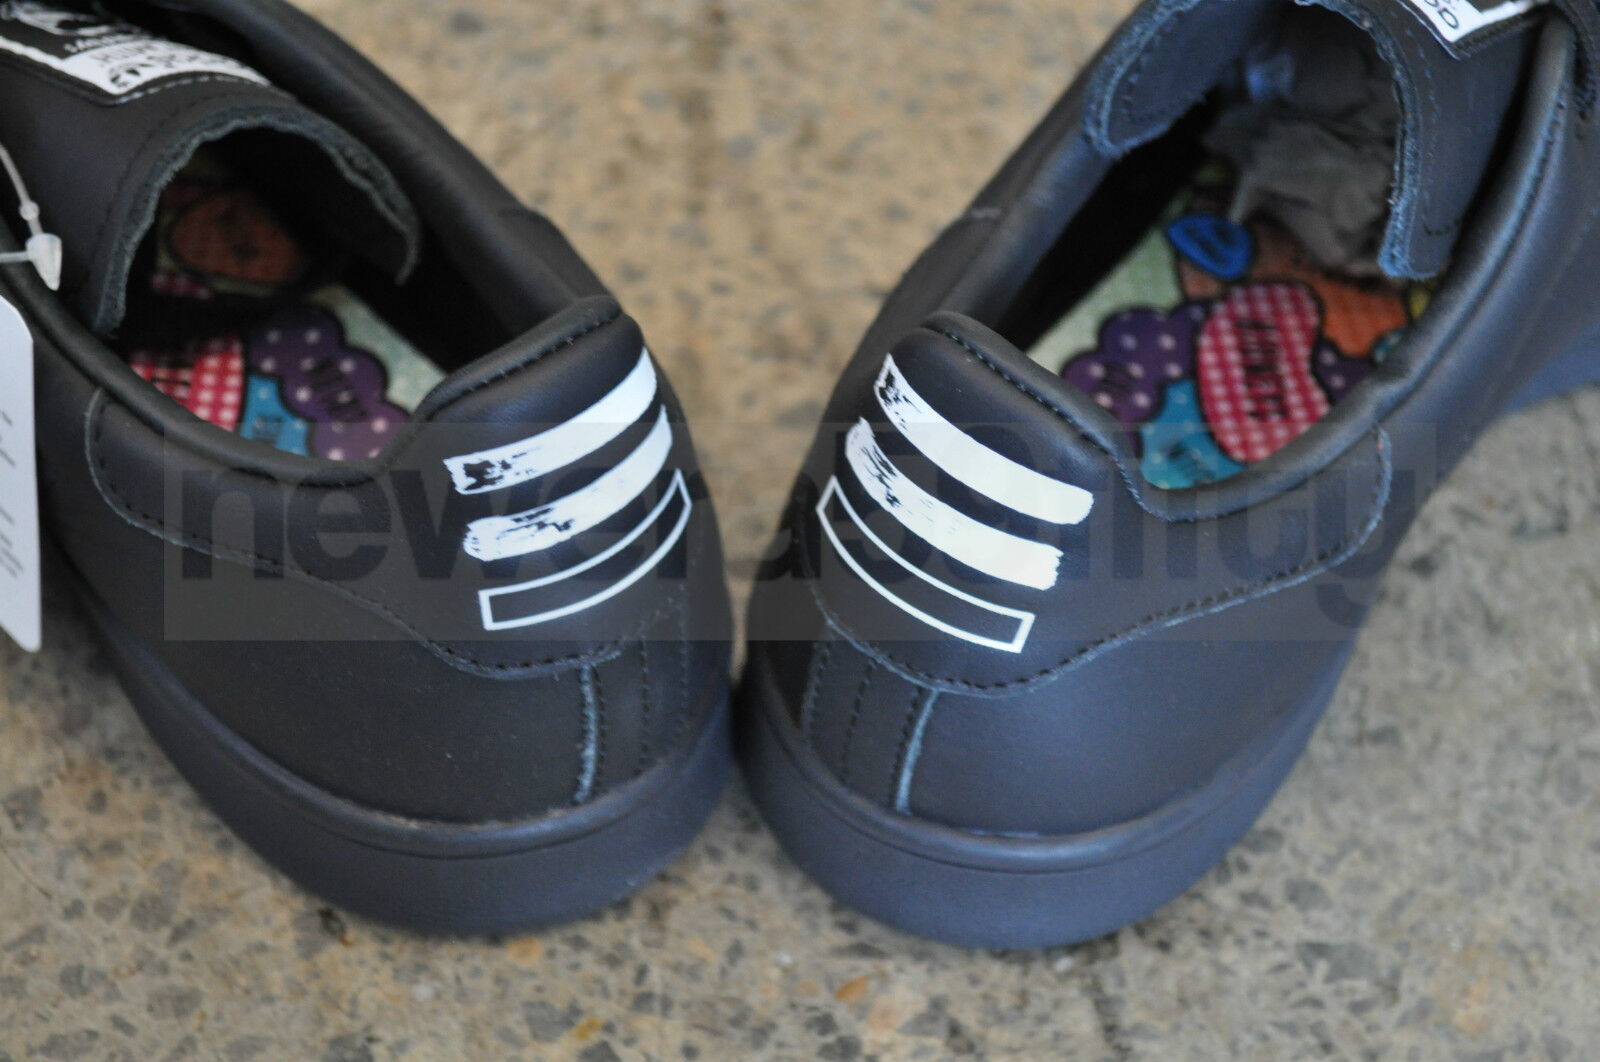 online retailer 11e7a 32193 60%OFF Adidas Consortium x Pharrell Williams Stan Smith Solid - Black